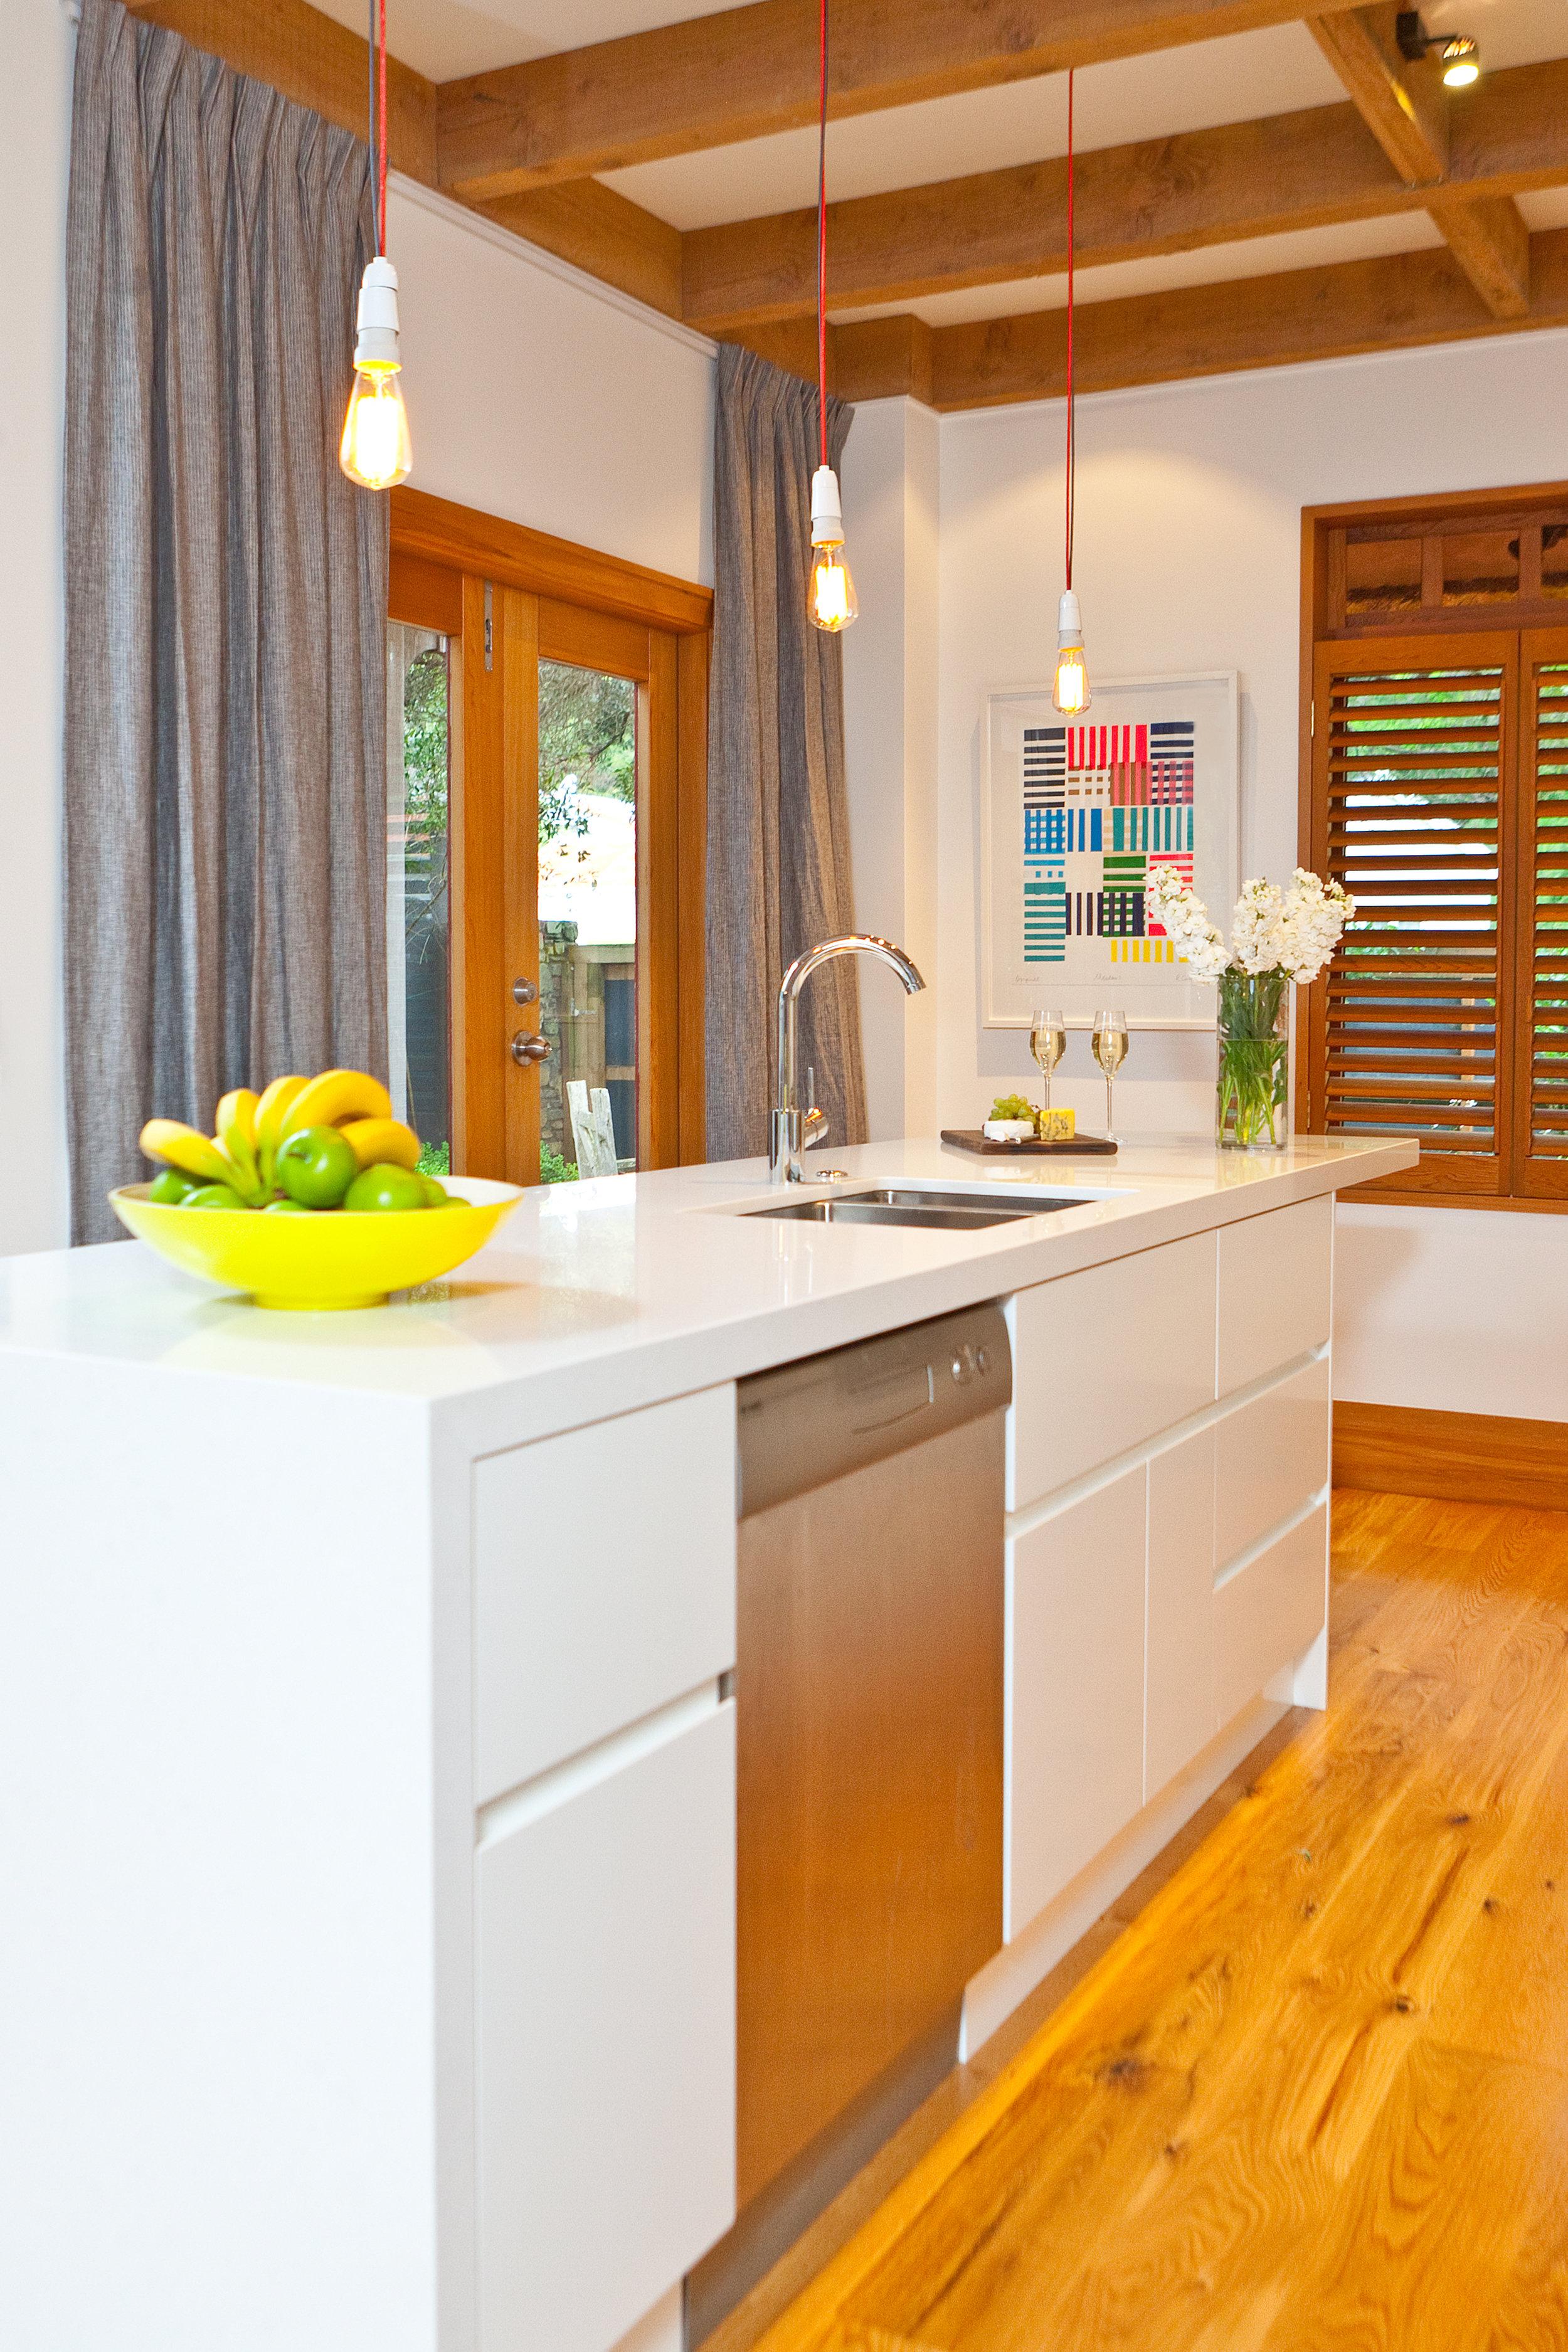 In Haus Design Imagery 142.jpg